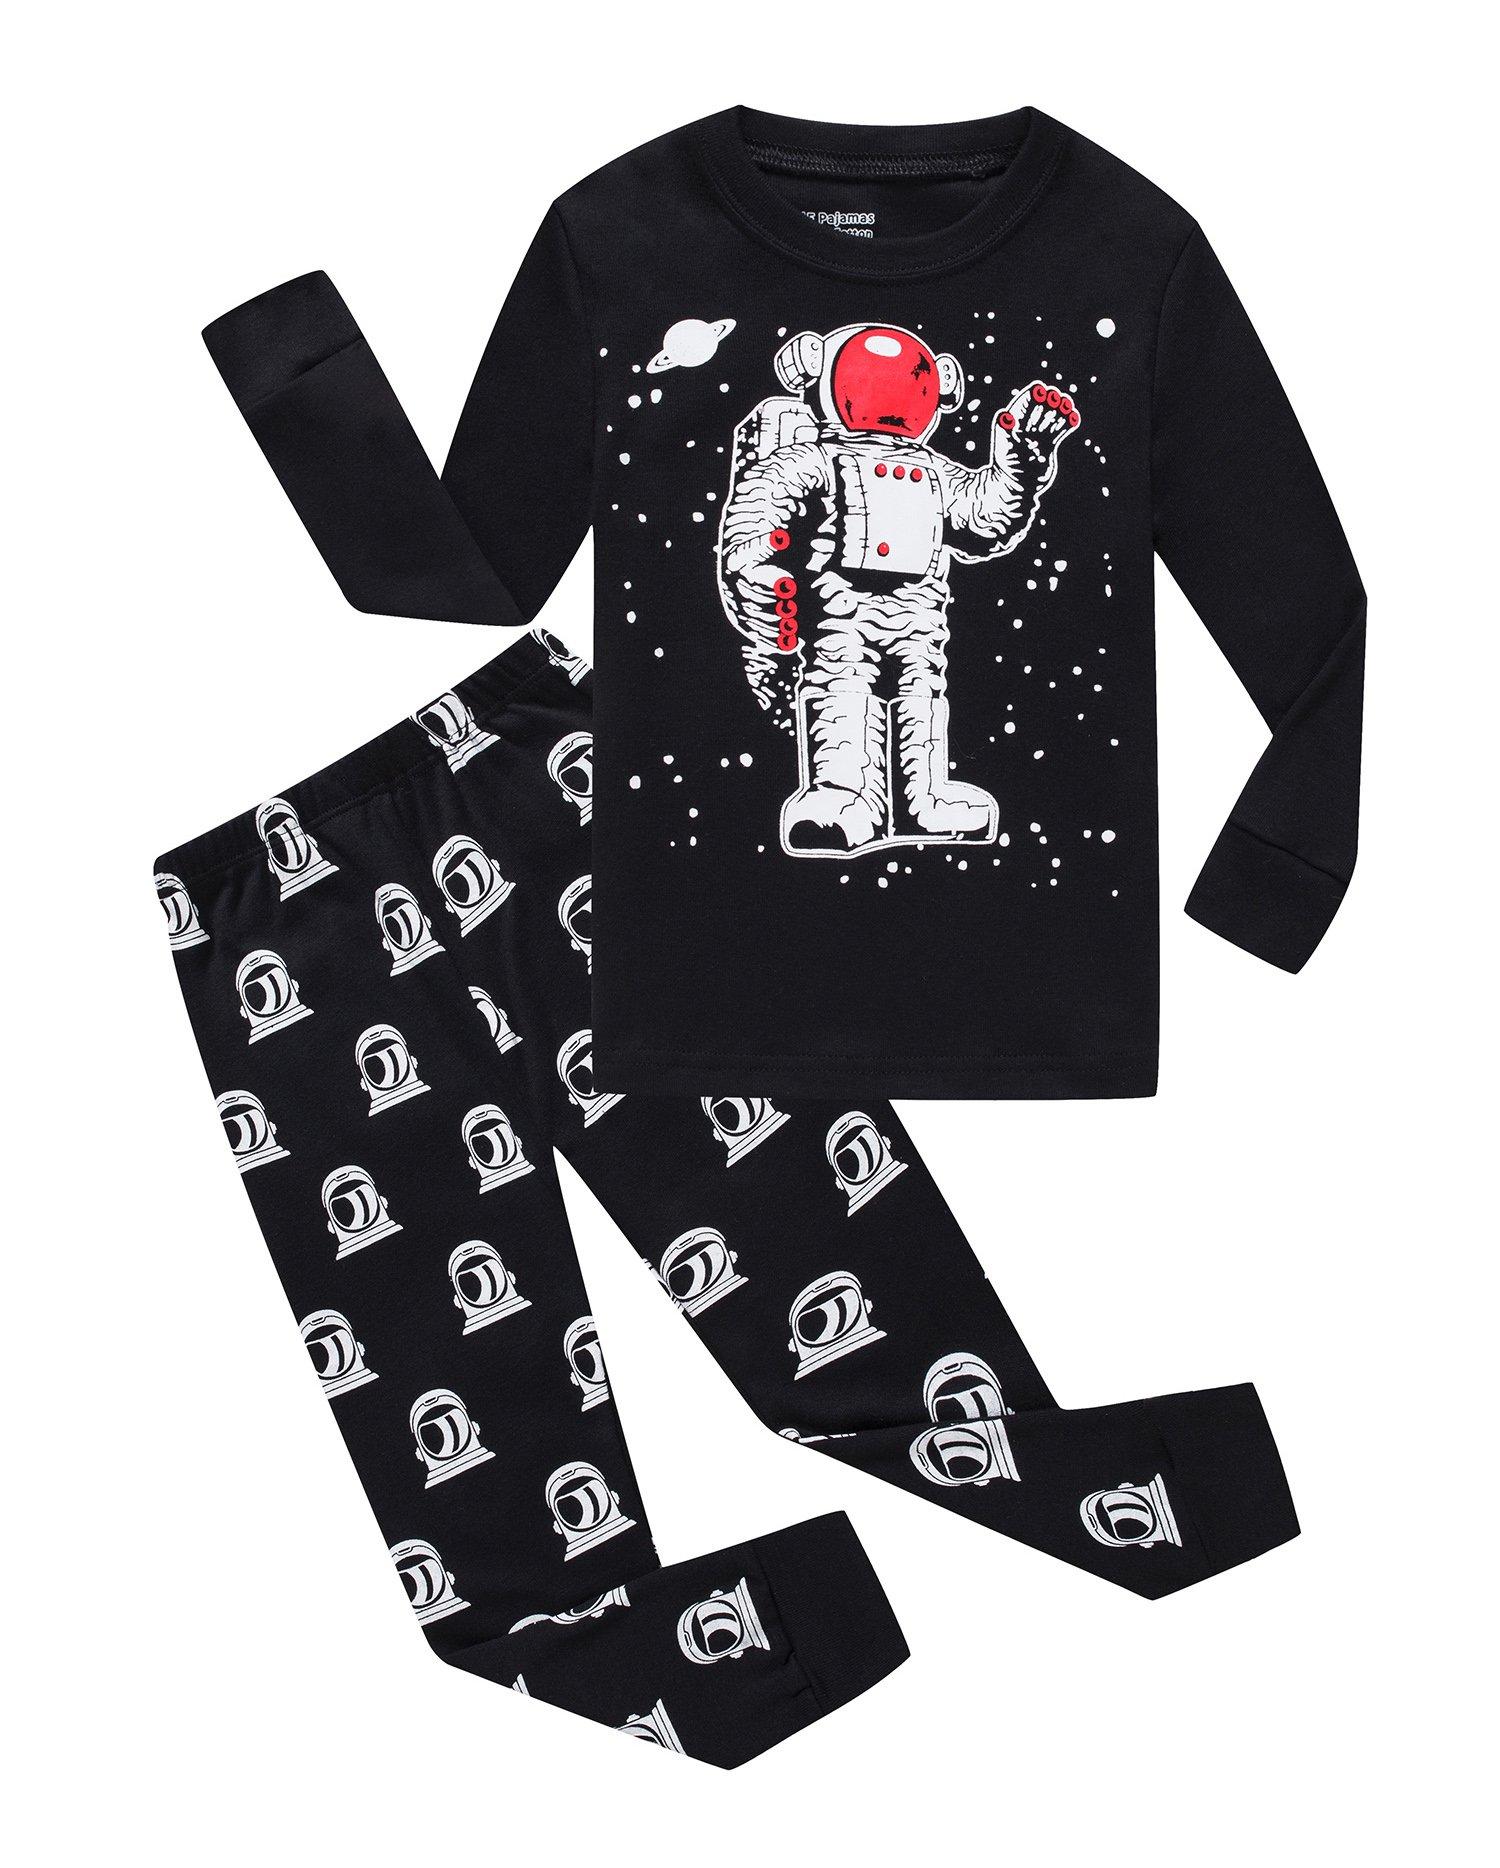 Astronaut Little Boys Long Sleeve Pajamas 100% Cotton Clothes Toddler Size 7